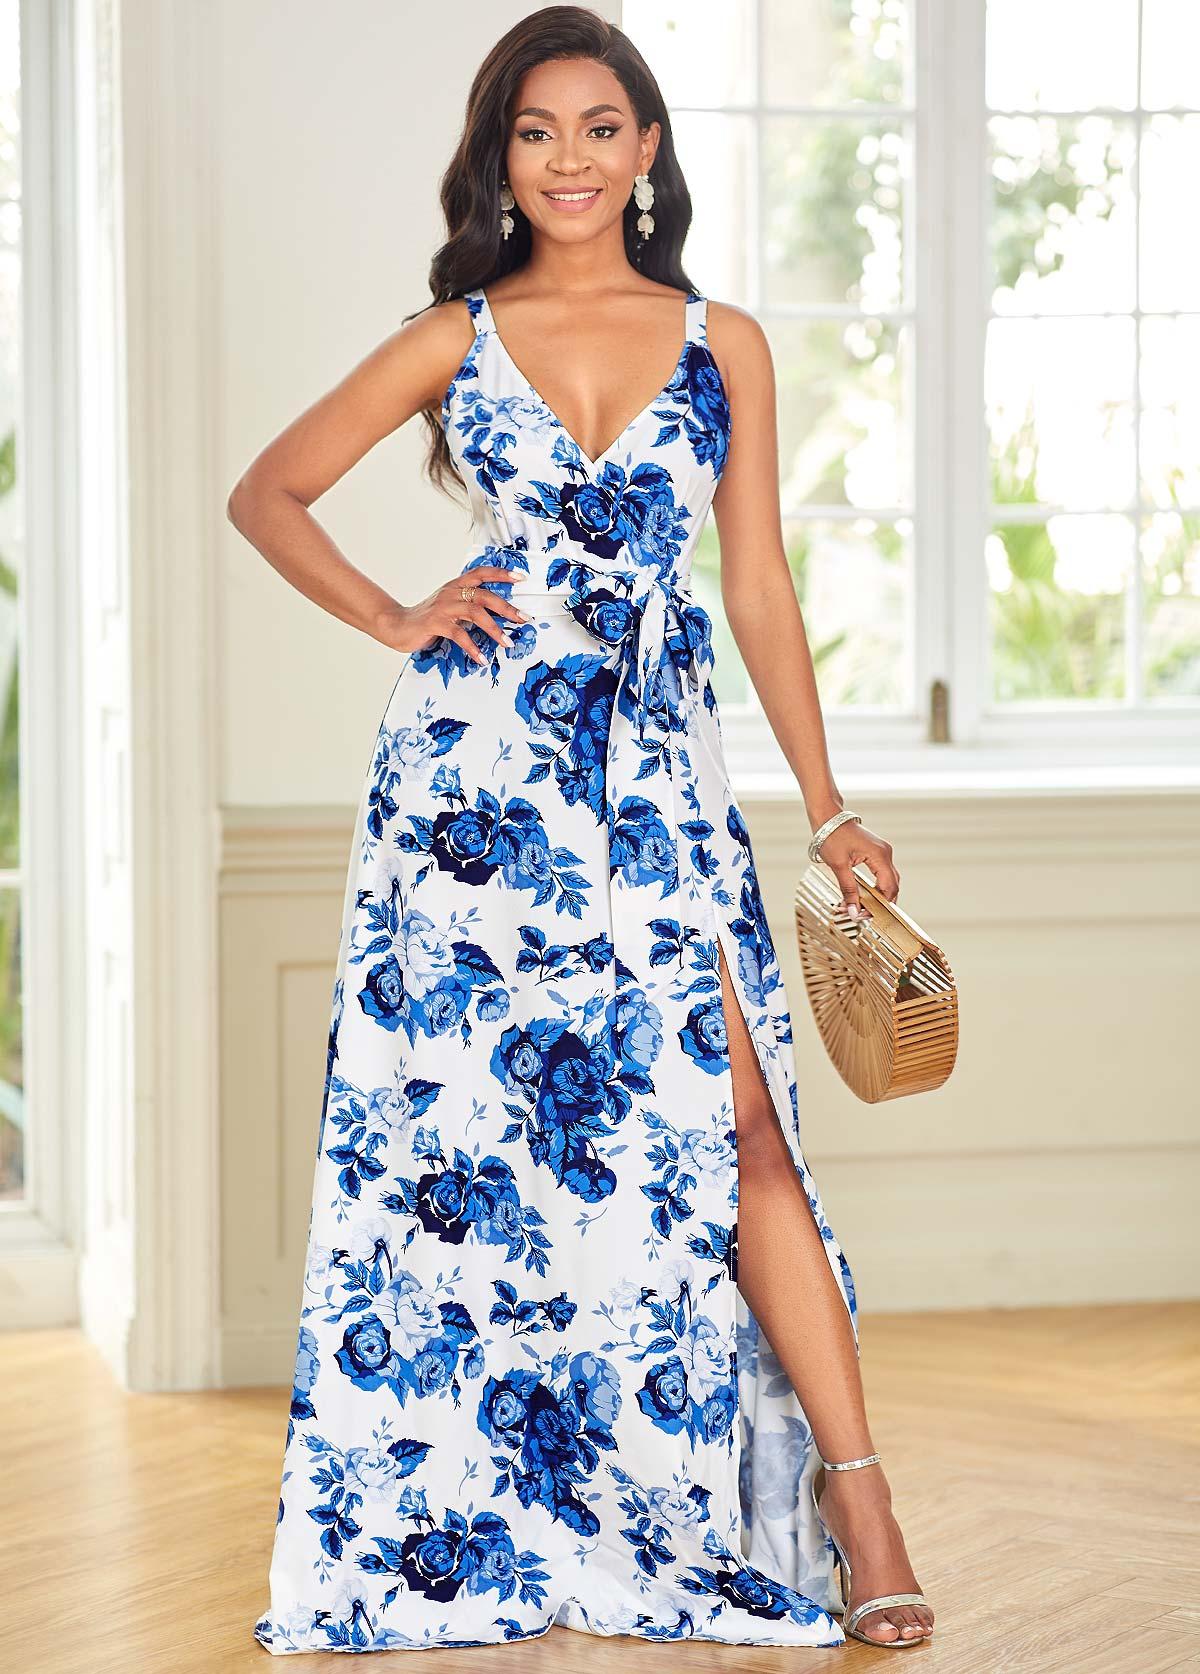 ROTITA Floral Print Spaghetti Strap High Slit Dress